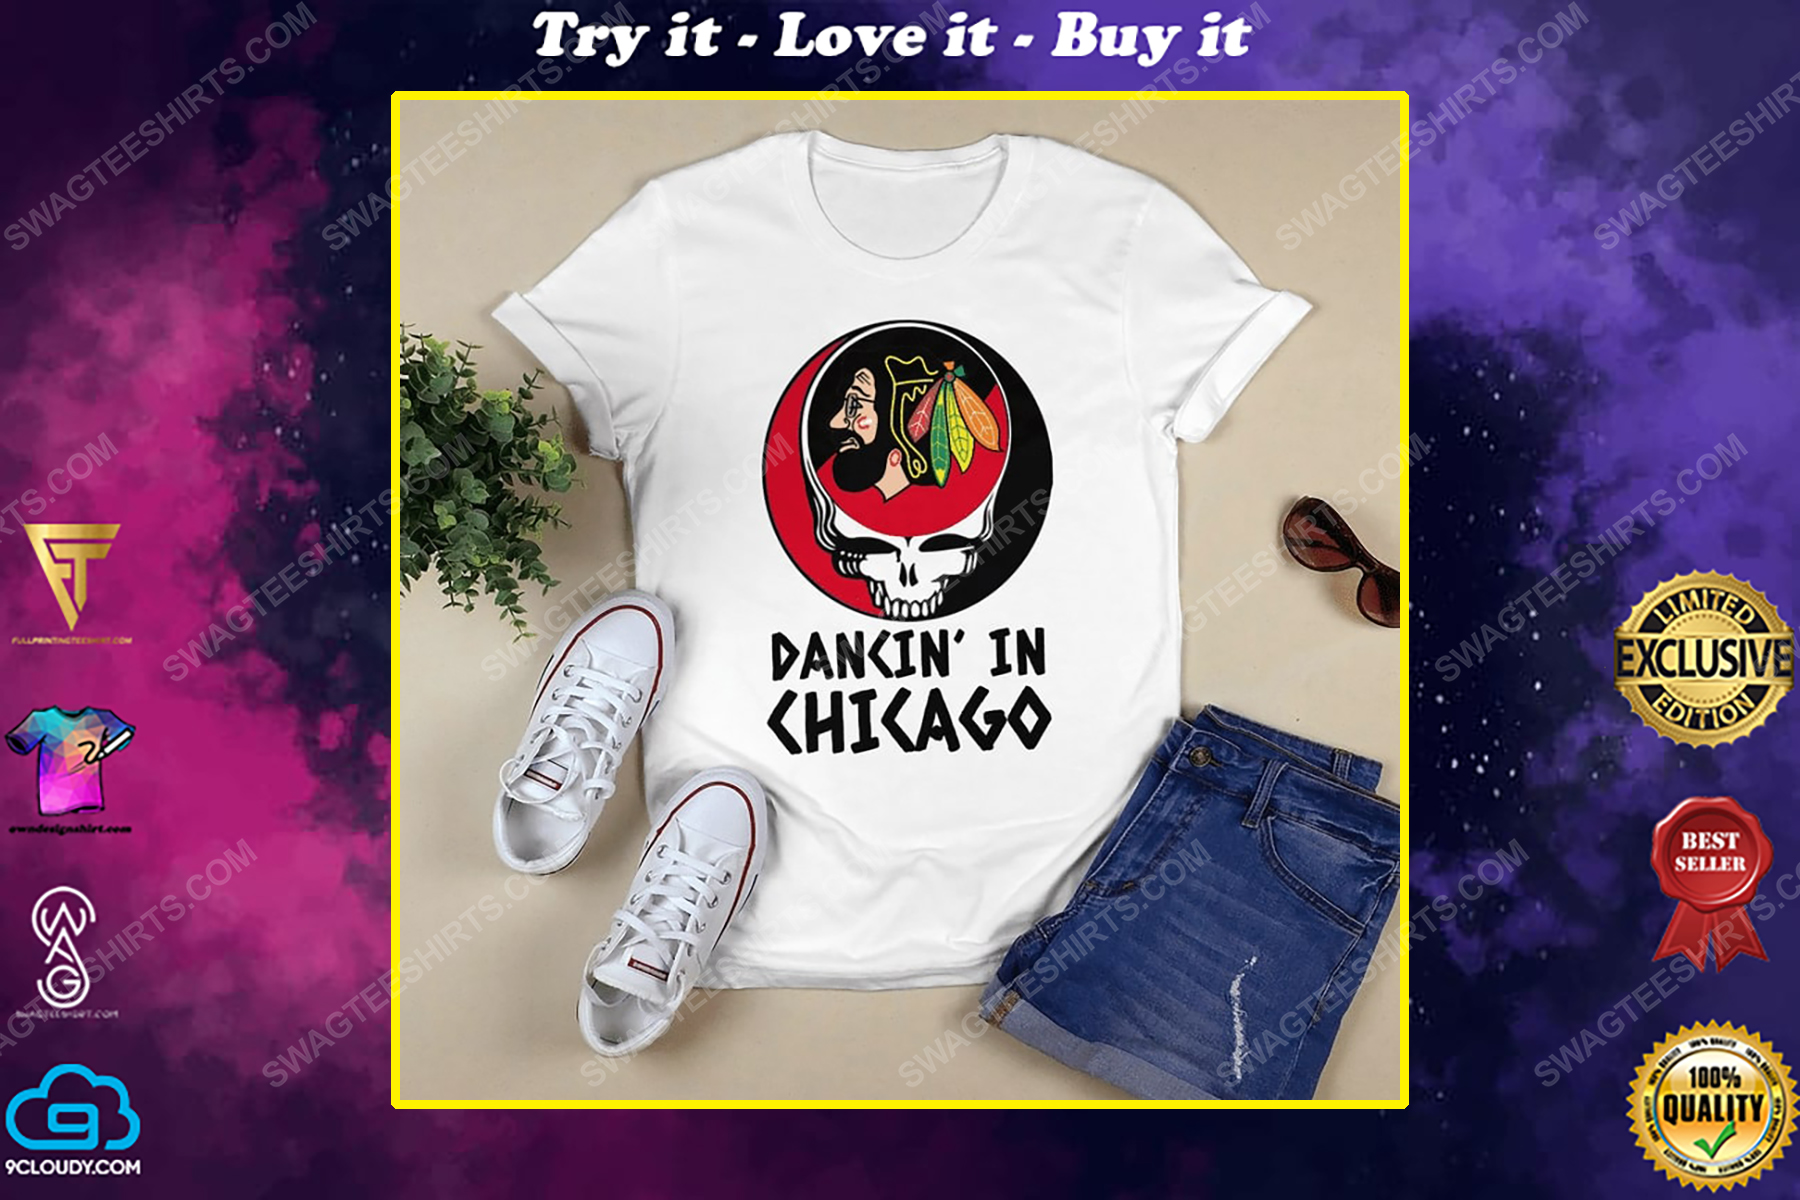 NHL chicago blackhawks and grateful dead dancin in chicago shirt